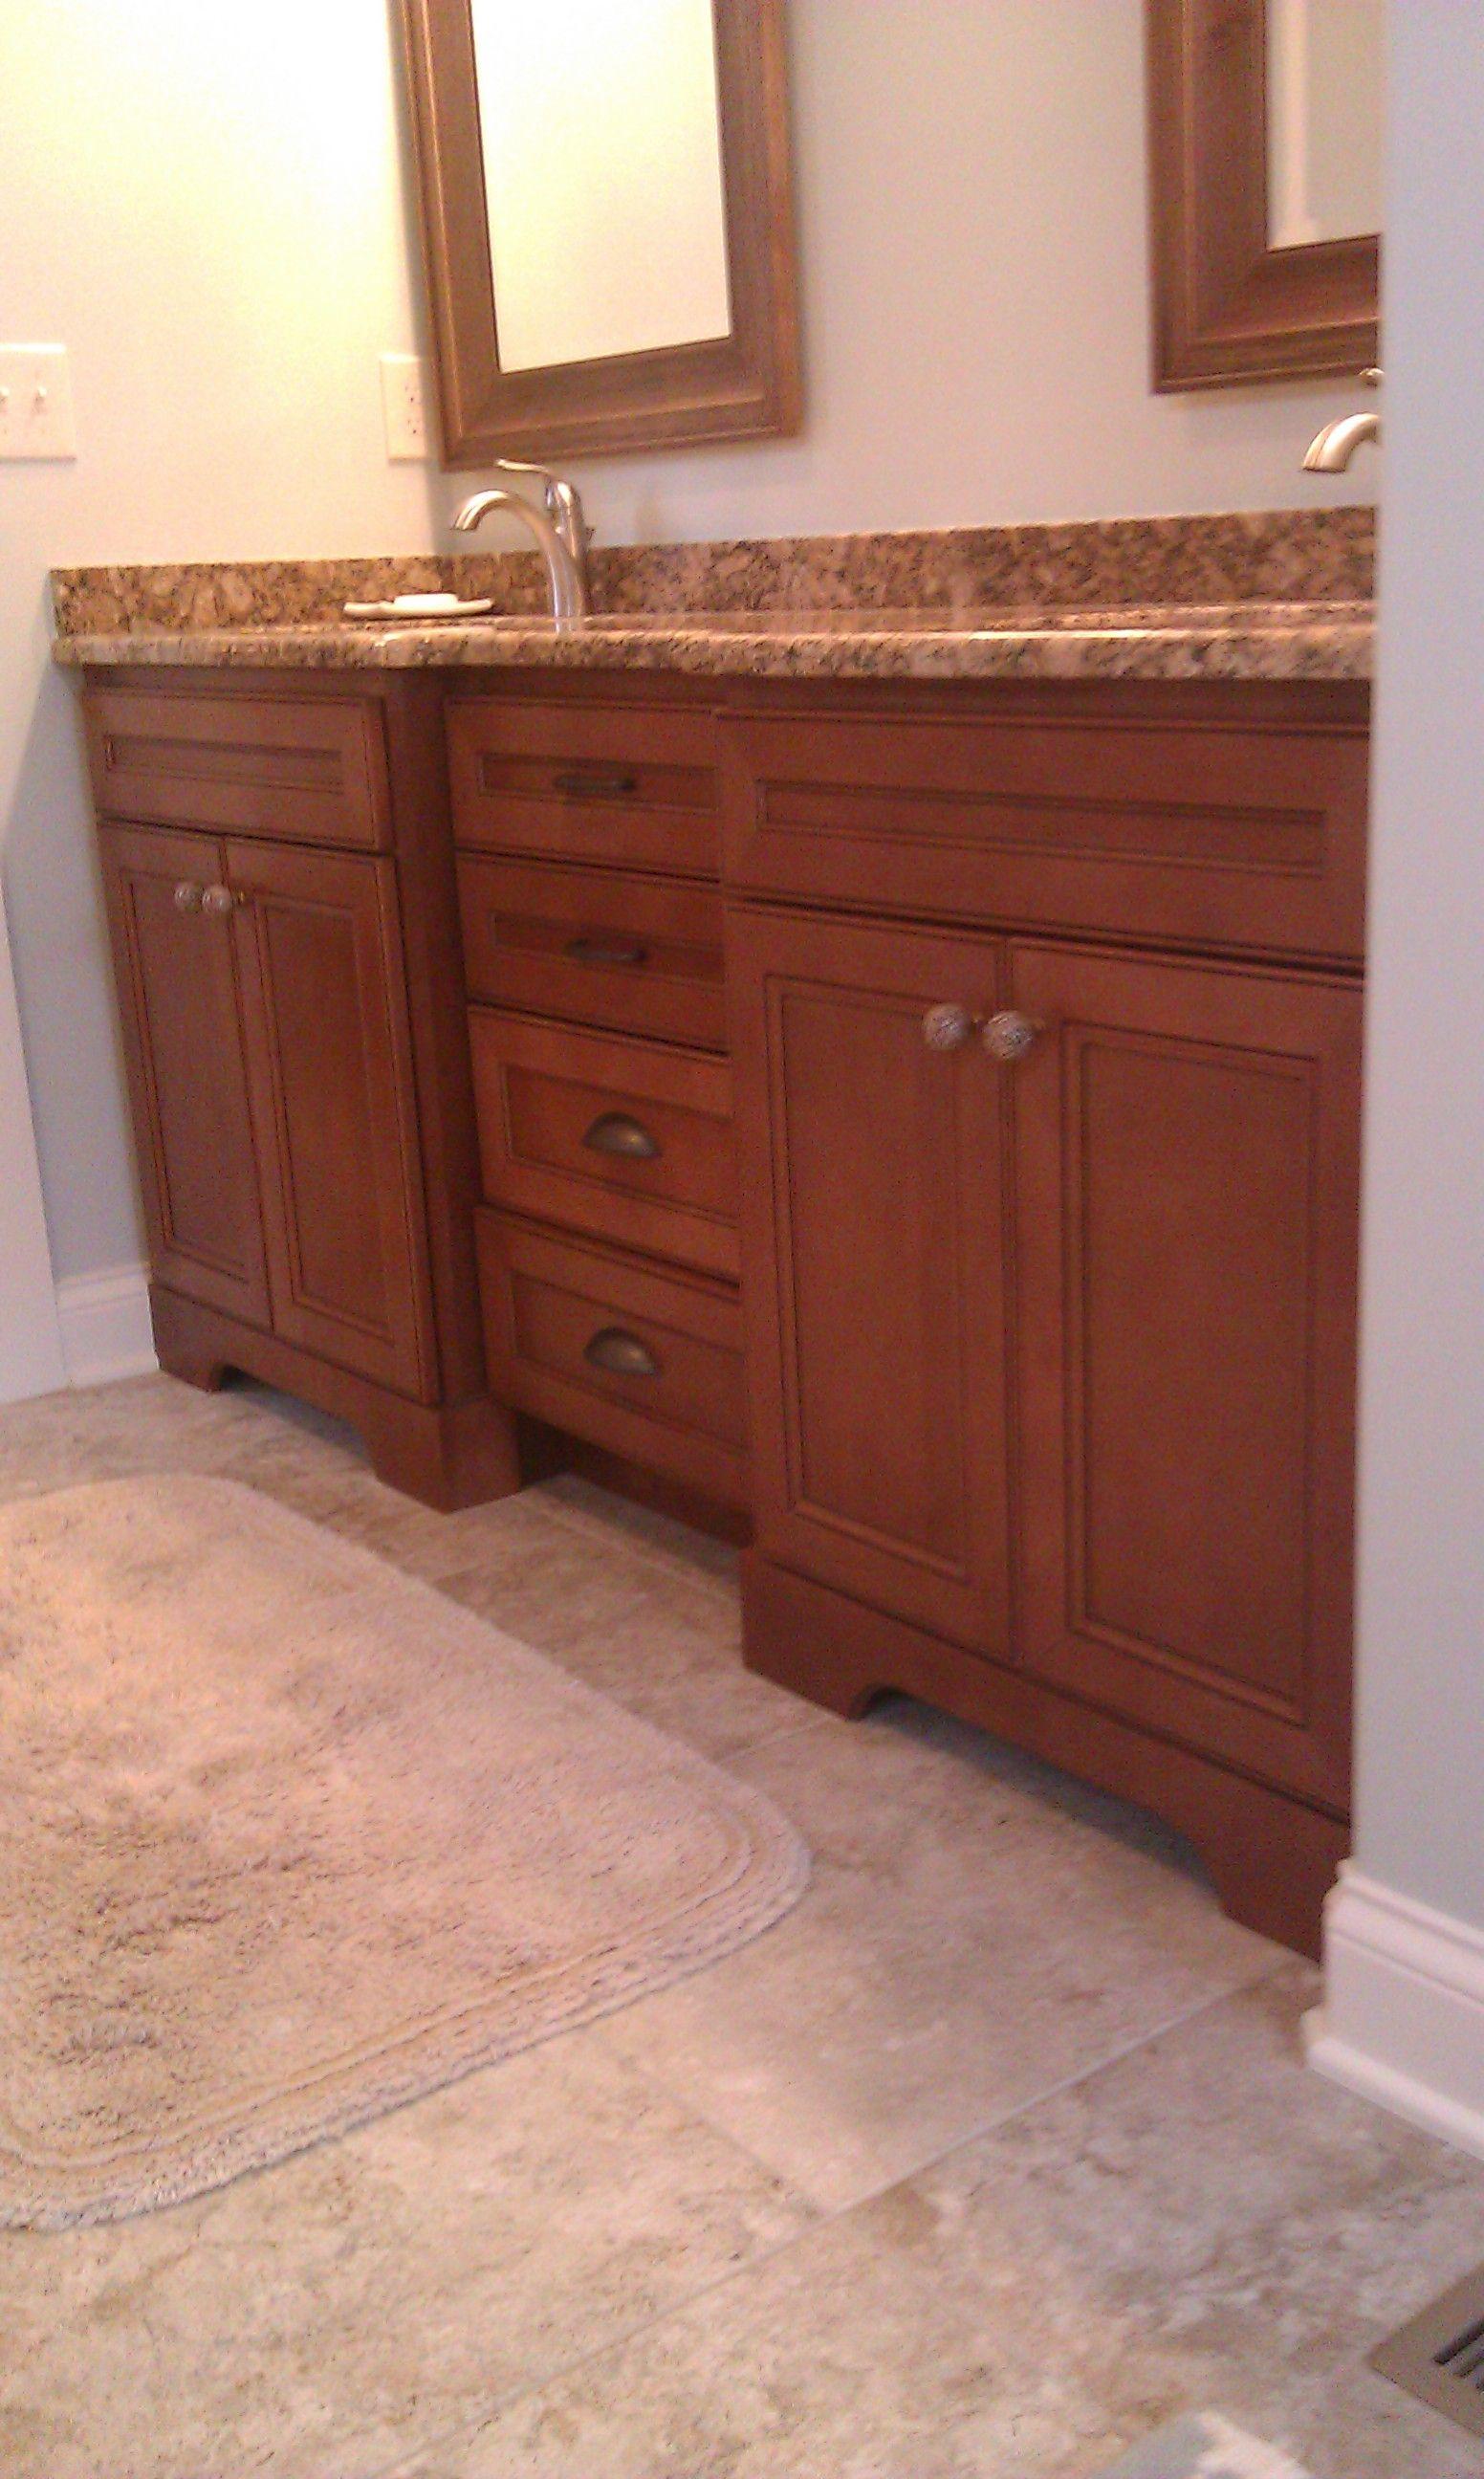 Master Bath Vanity Cabinet Homecrest Cabinetry Eastport Maple - 96 bathroom vanity cabinets for bathroom decor ideas